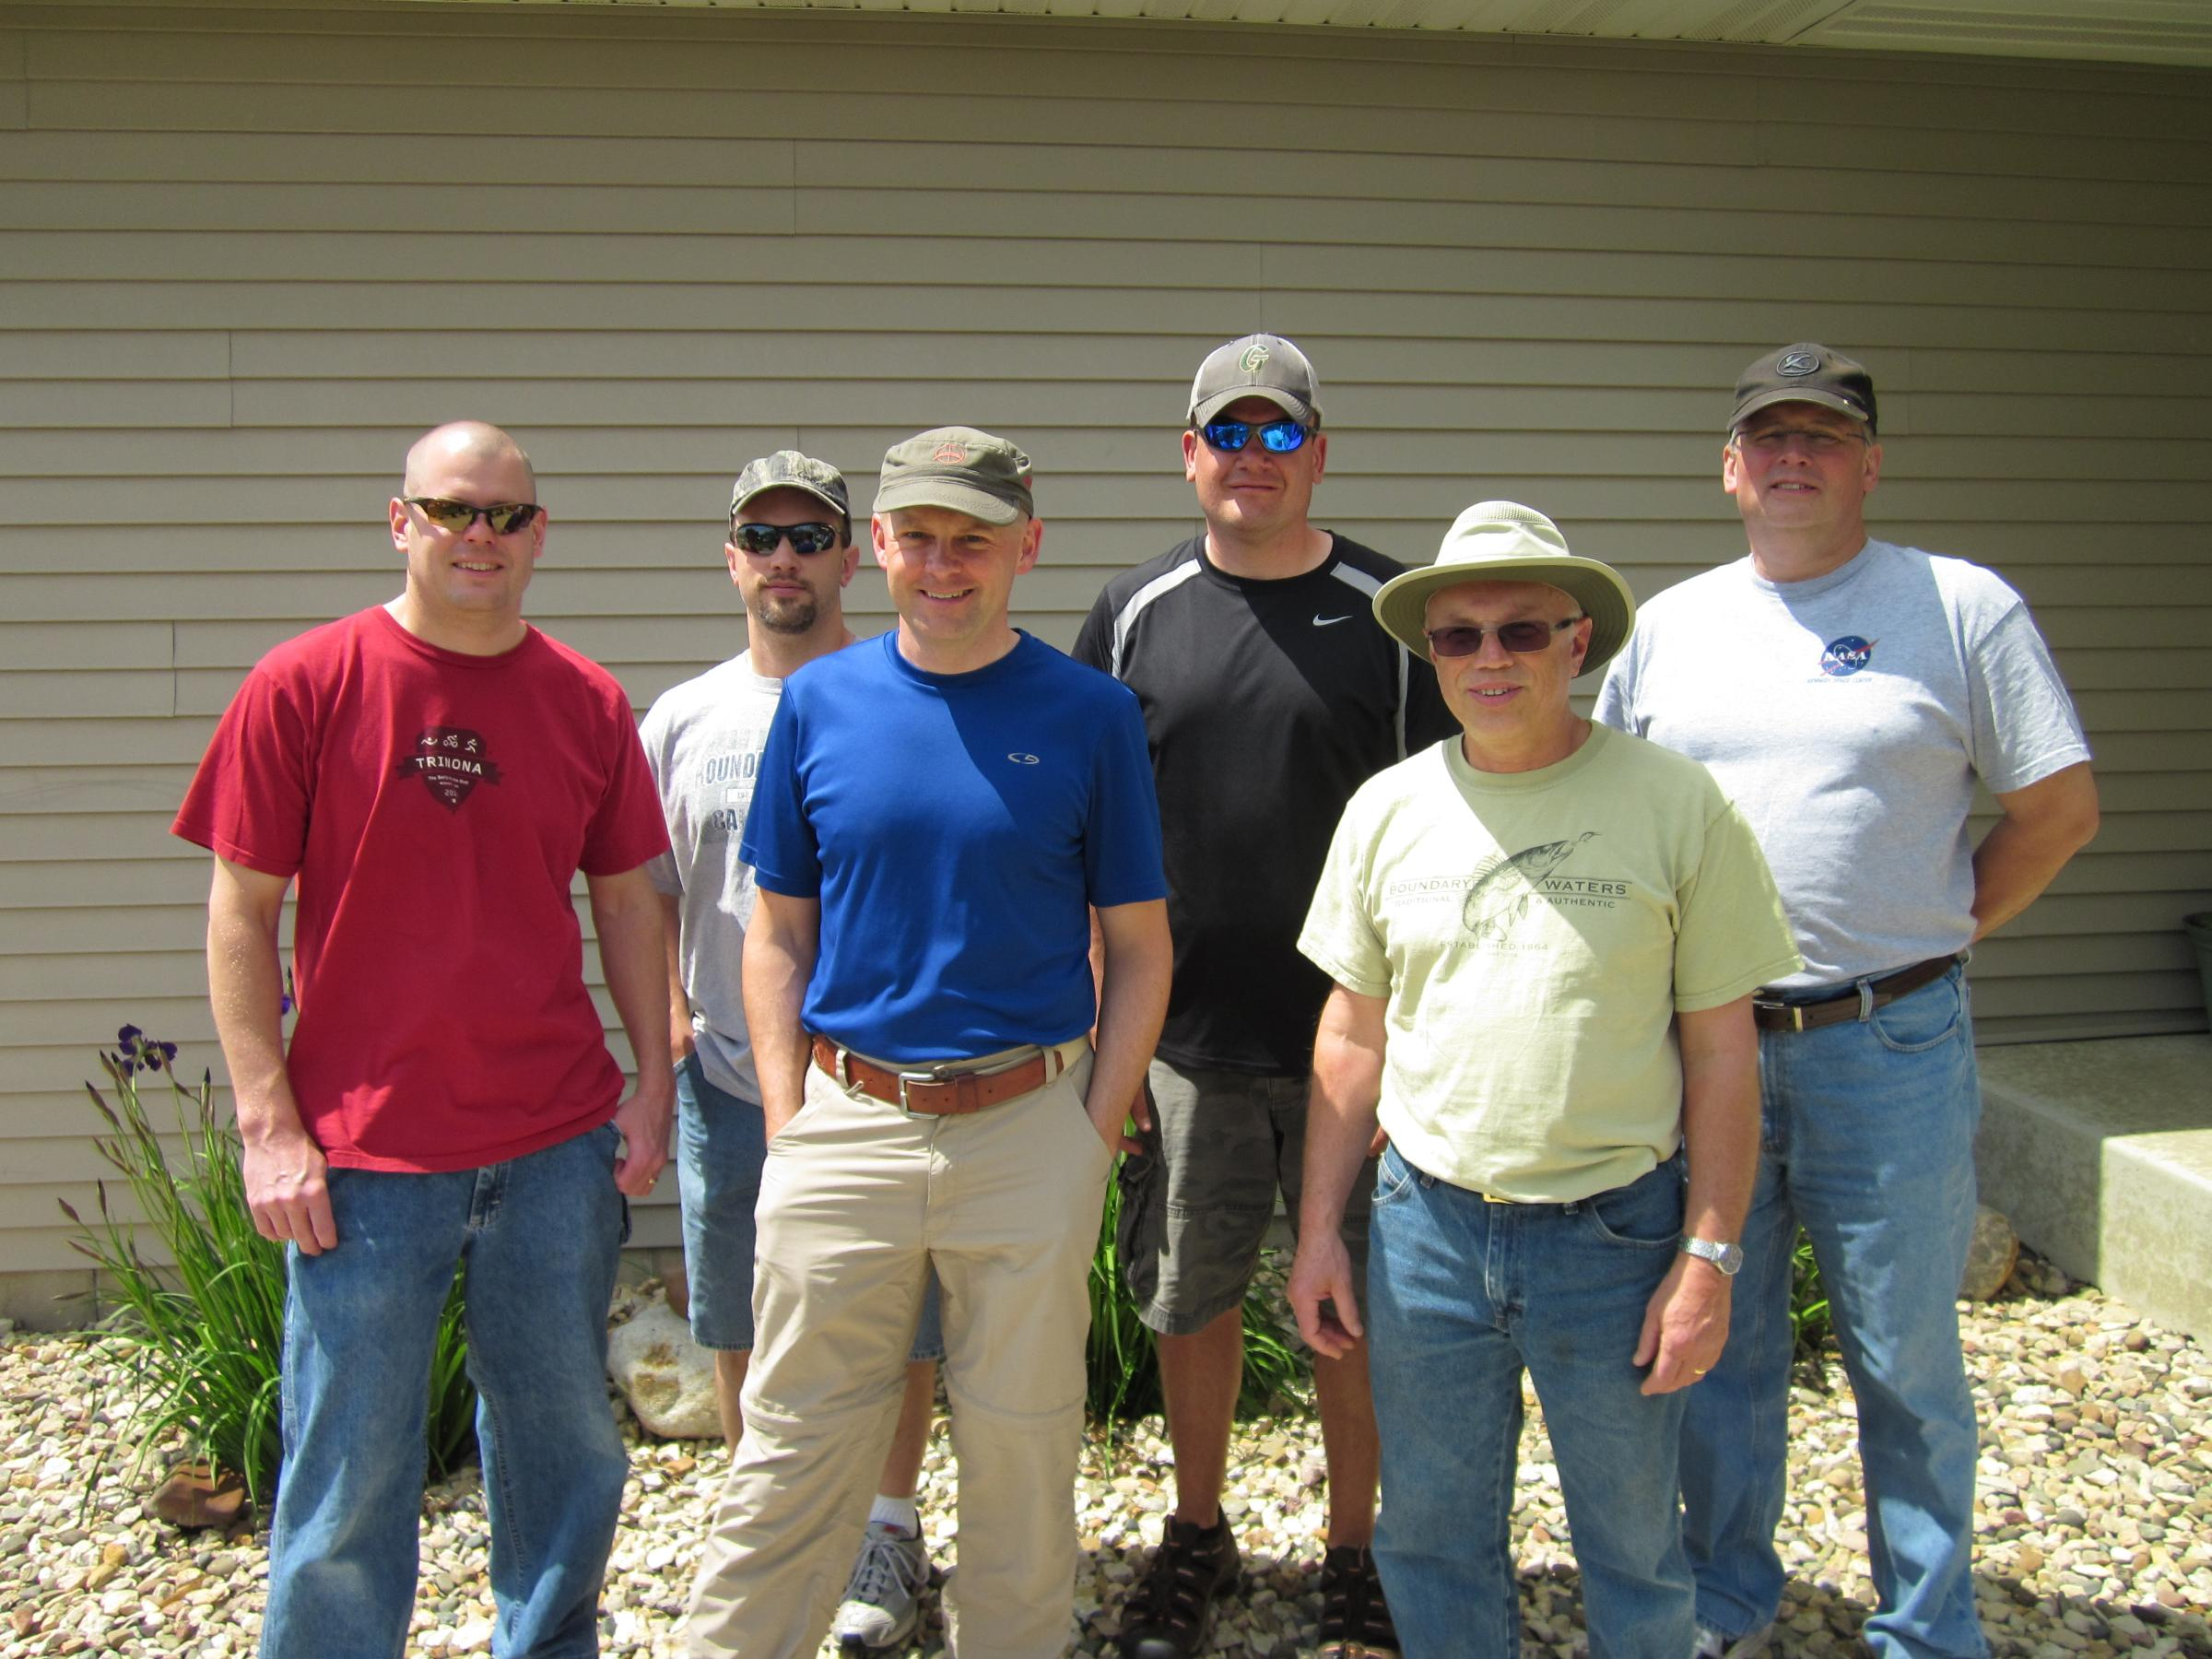 2012 group (minus buzz17)